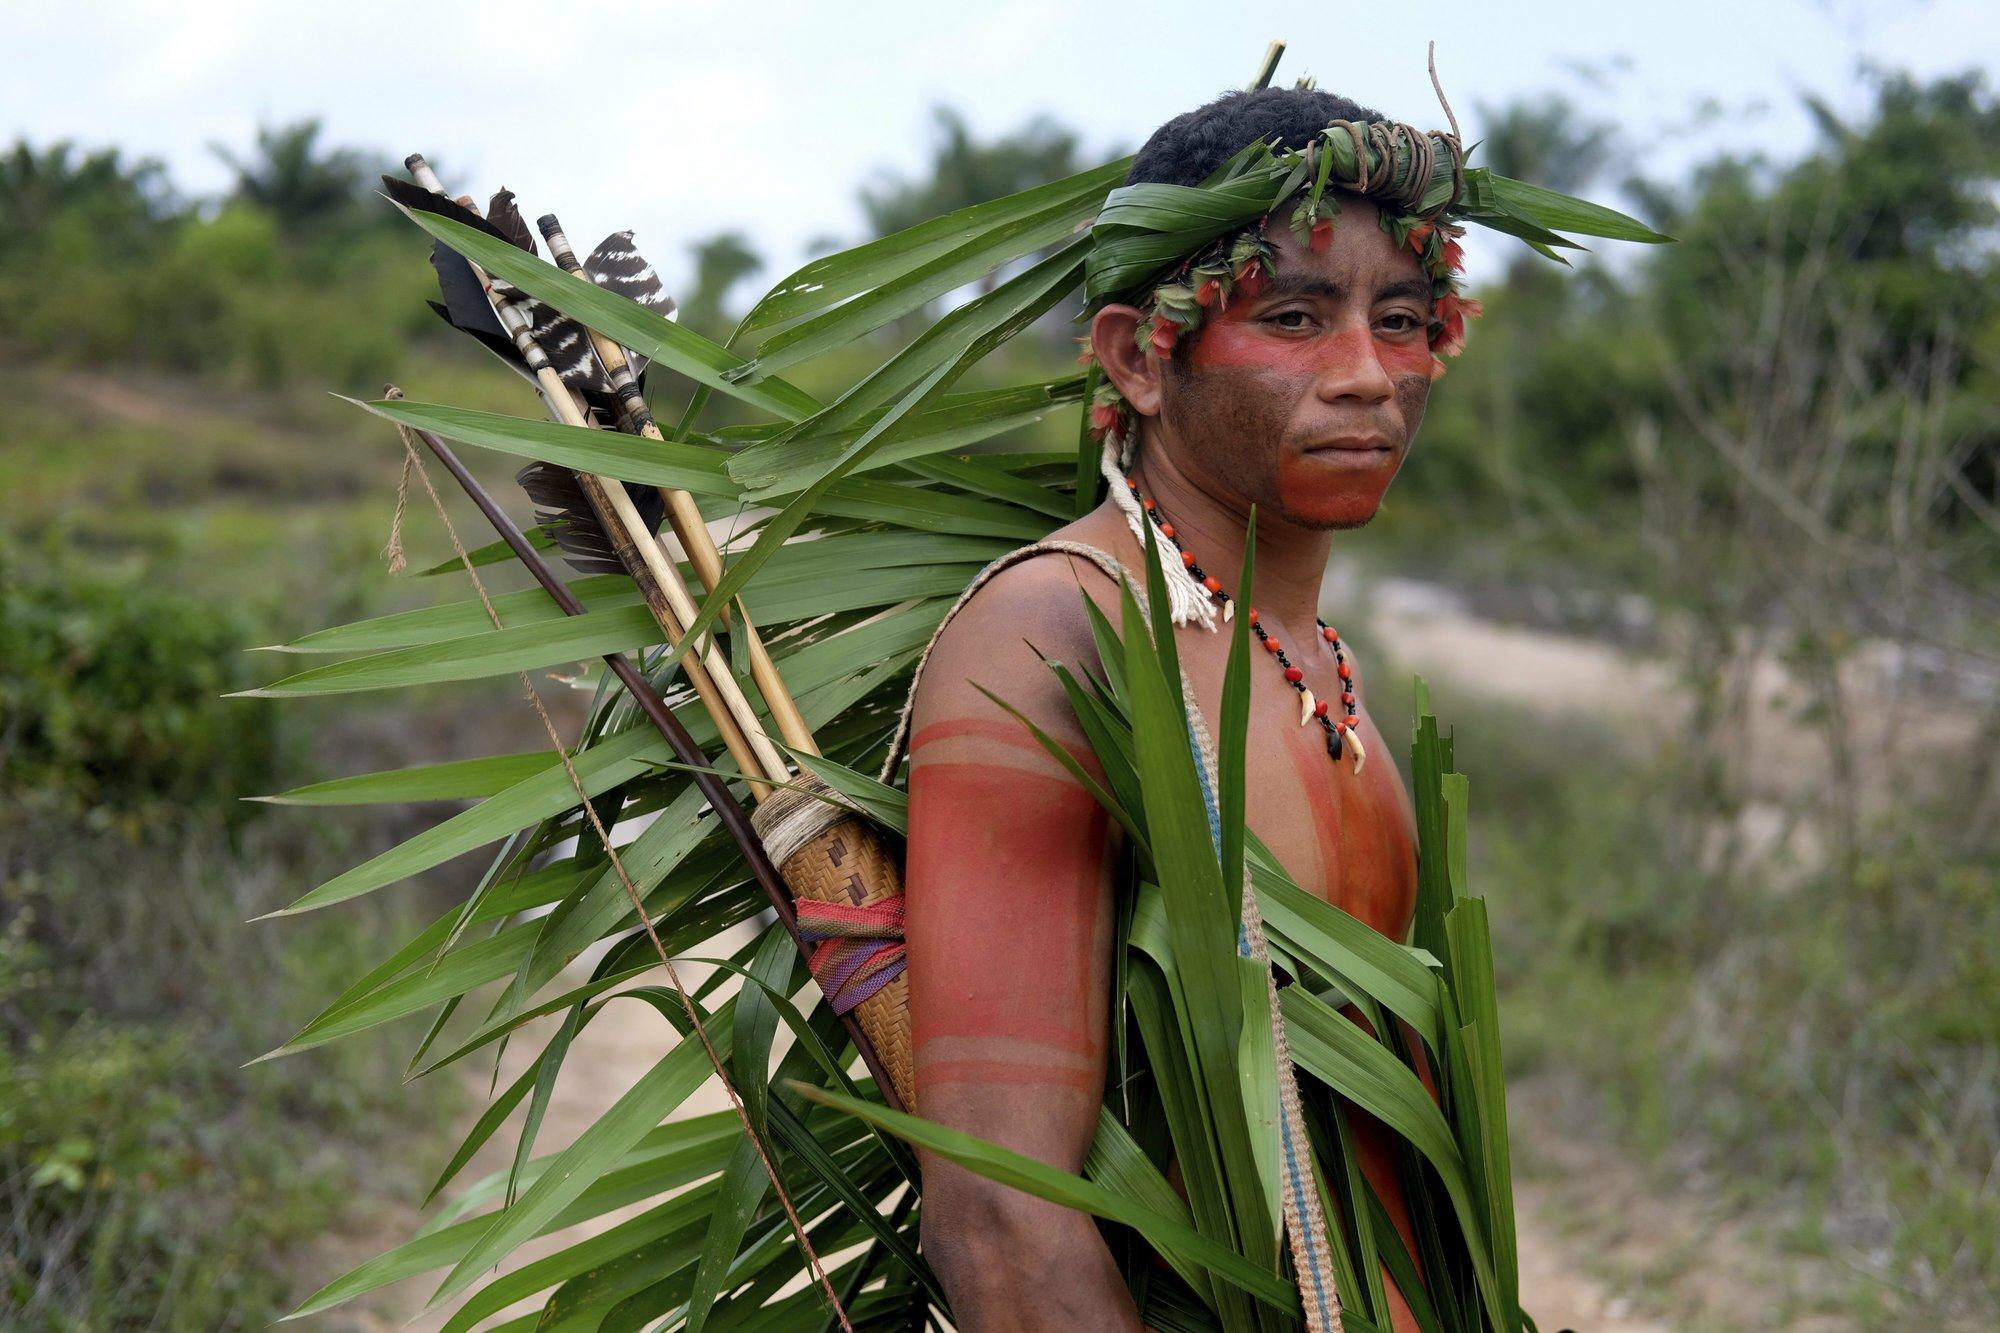 Amazon tribe in Brazil patrols territory, braces for fight